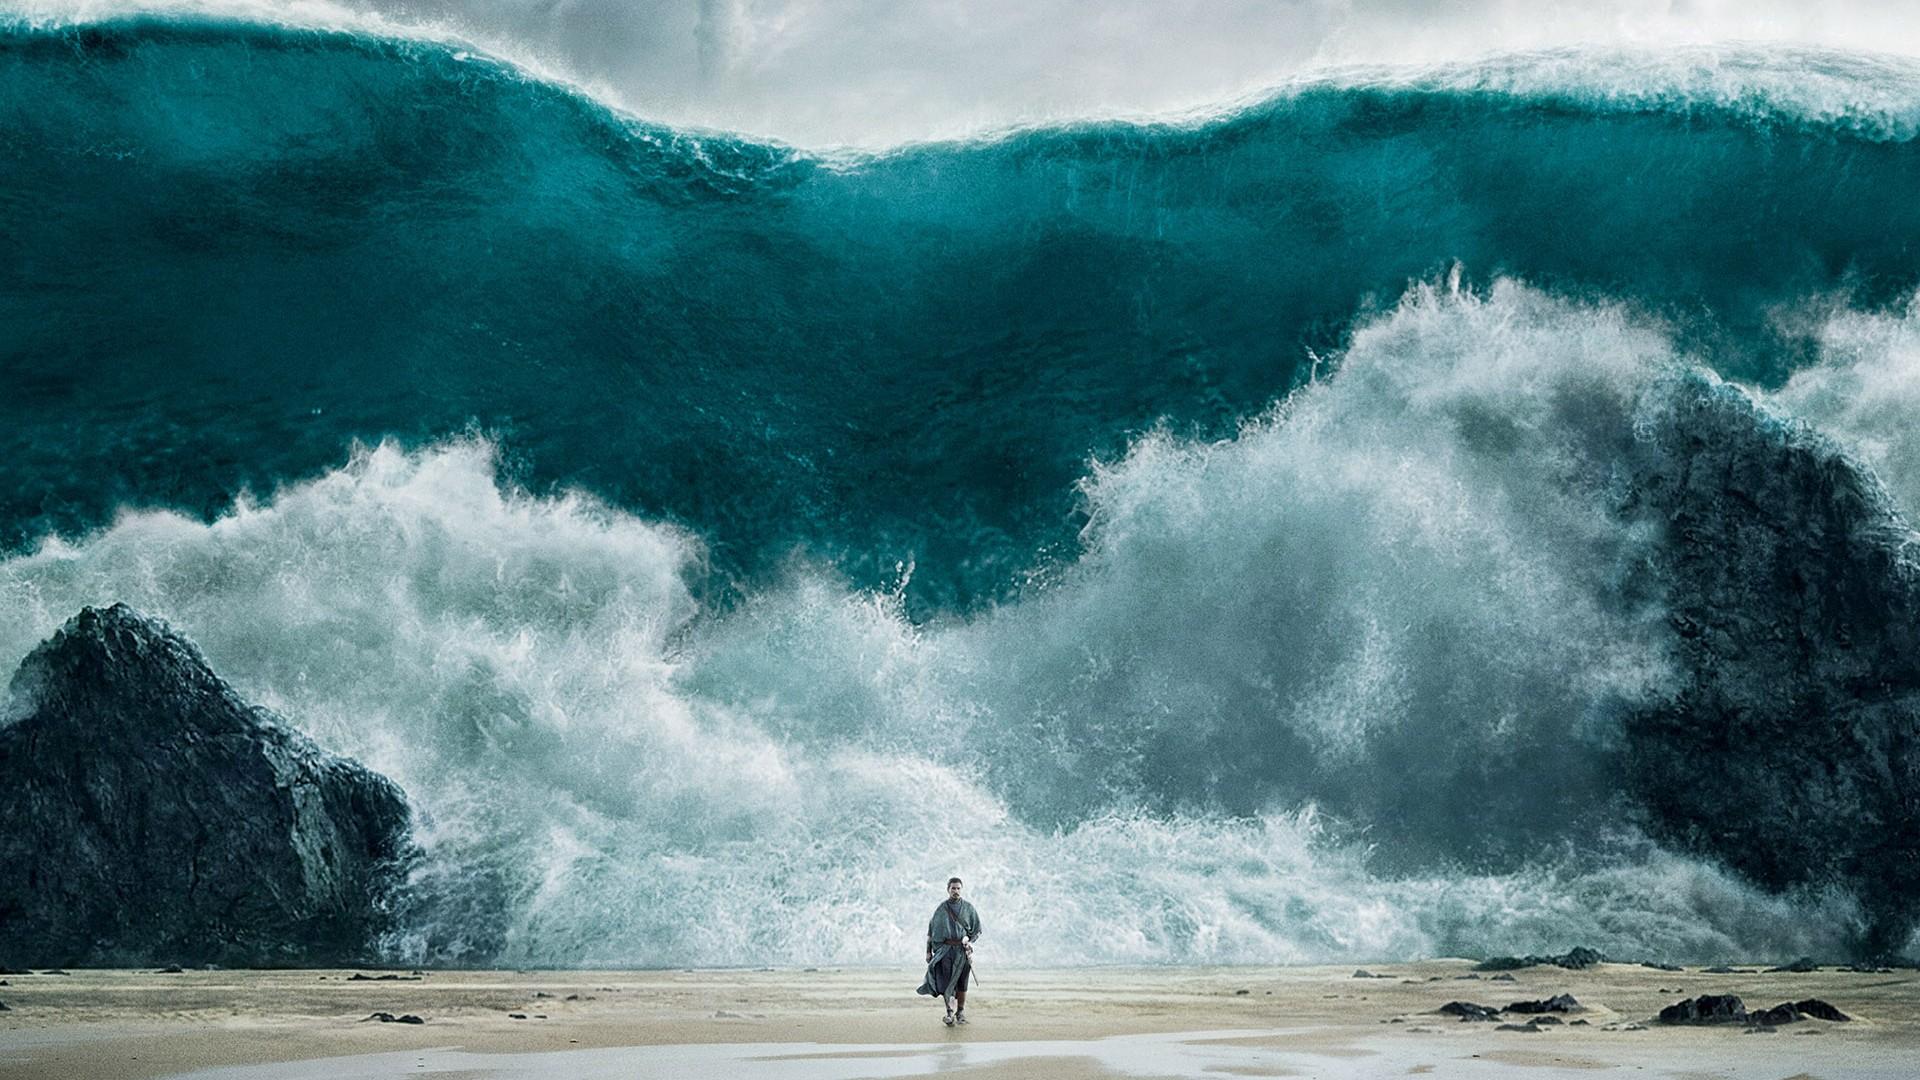 hd ocean scene wallpapers